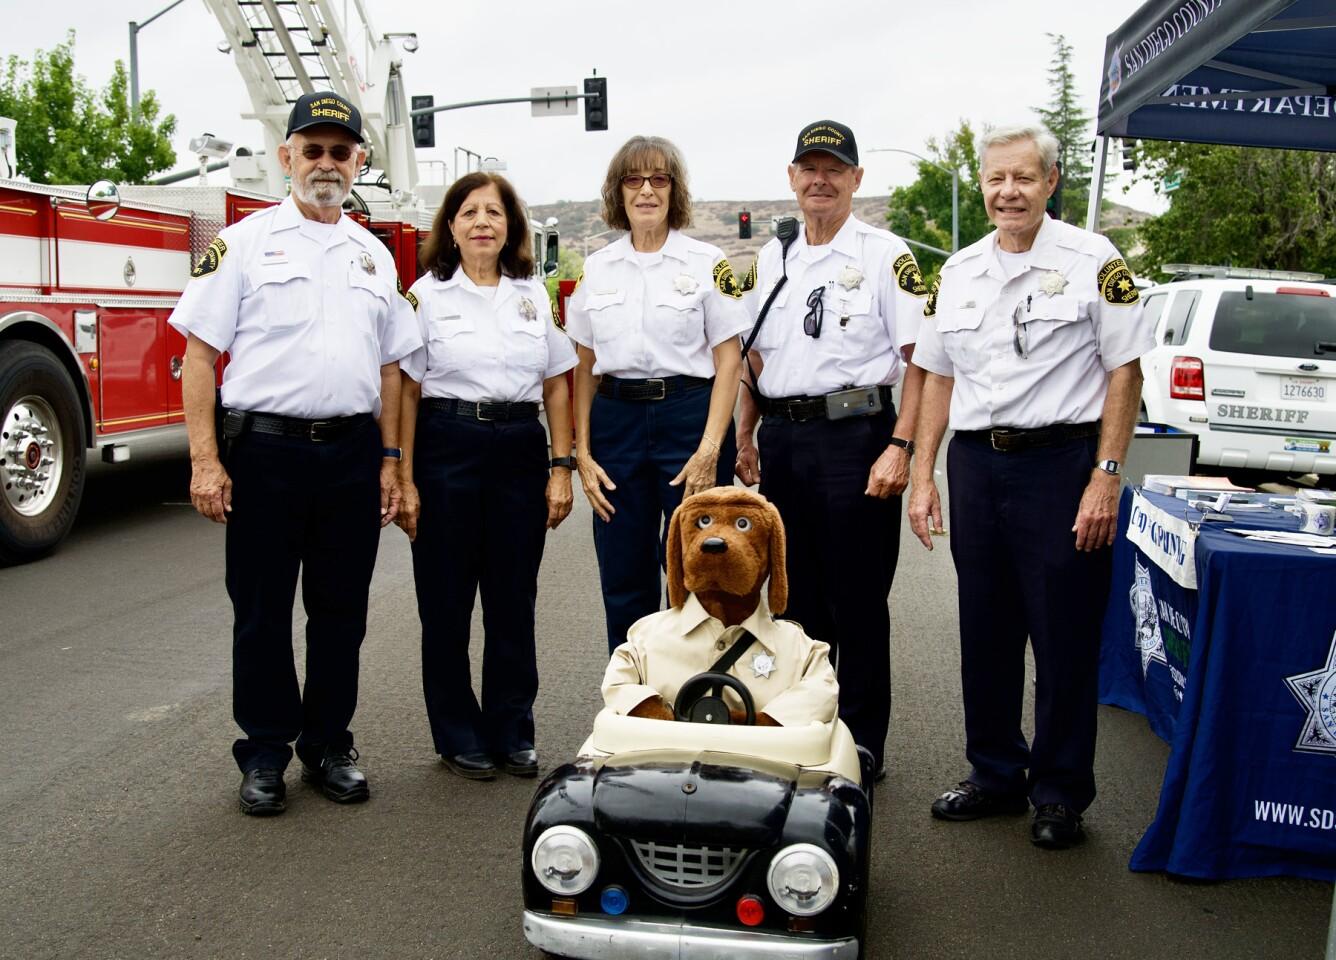 Poway Senior Volunteer Patrol members Donald Hershberger, Franchesca Walker, Paula Saltz, Dick Shope and Pete Babich.